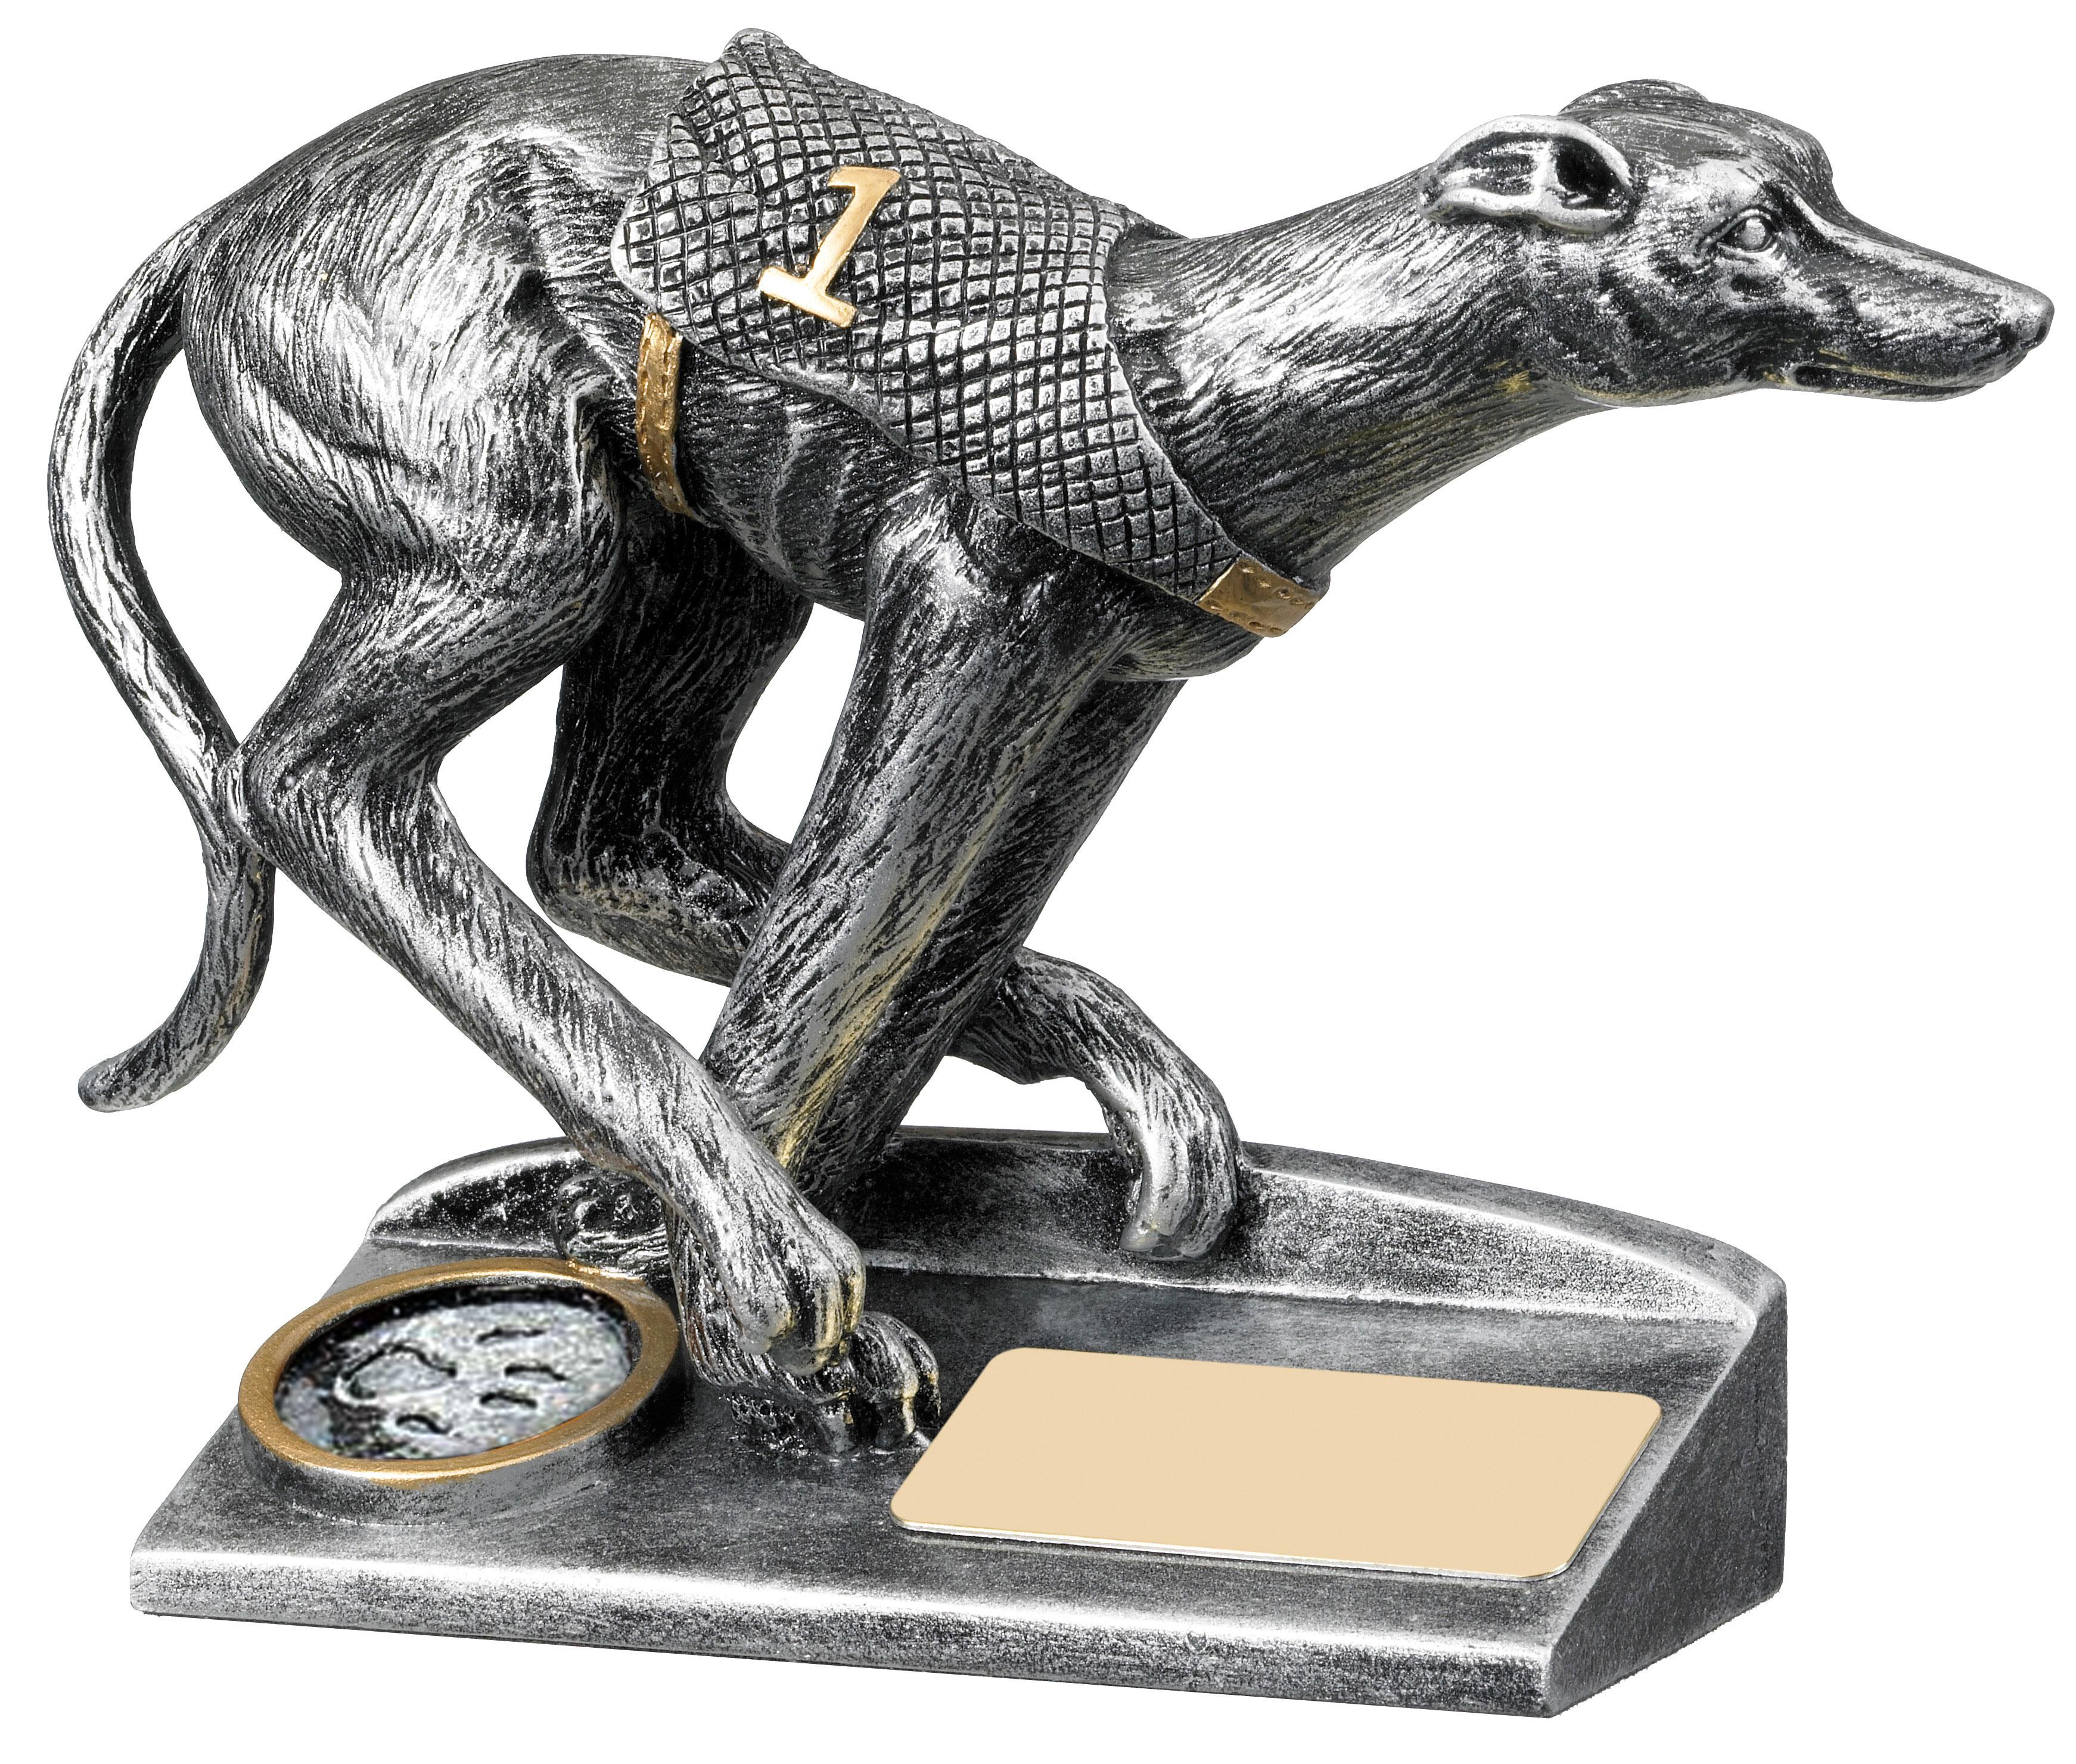 "Antique Silver Greyhound Racing Trophy 12.5cm (5"")"